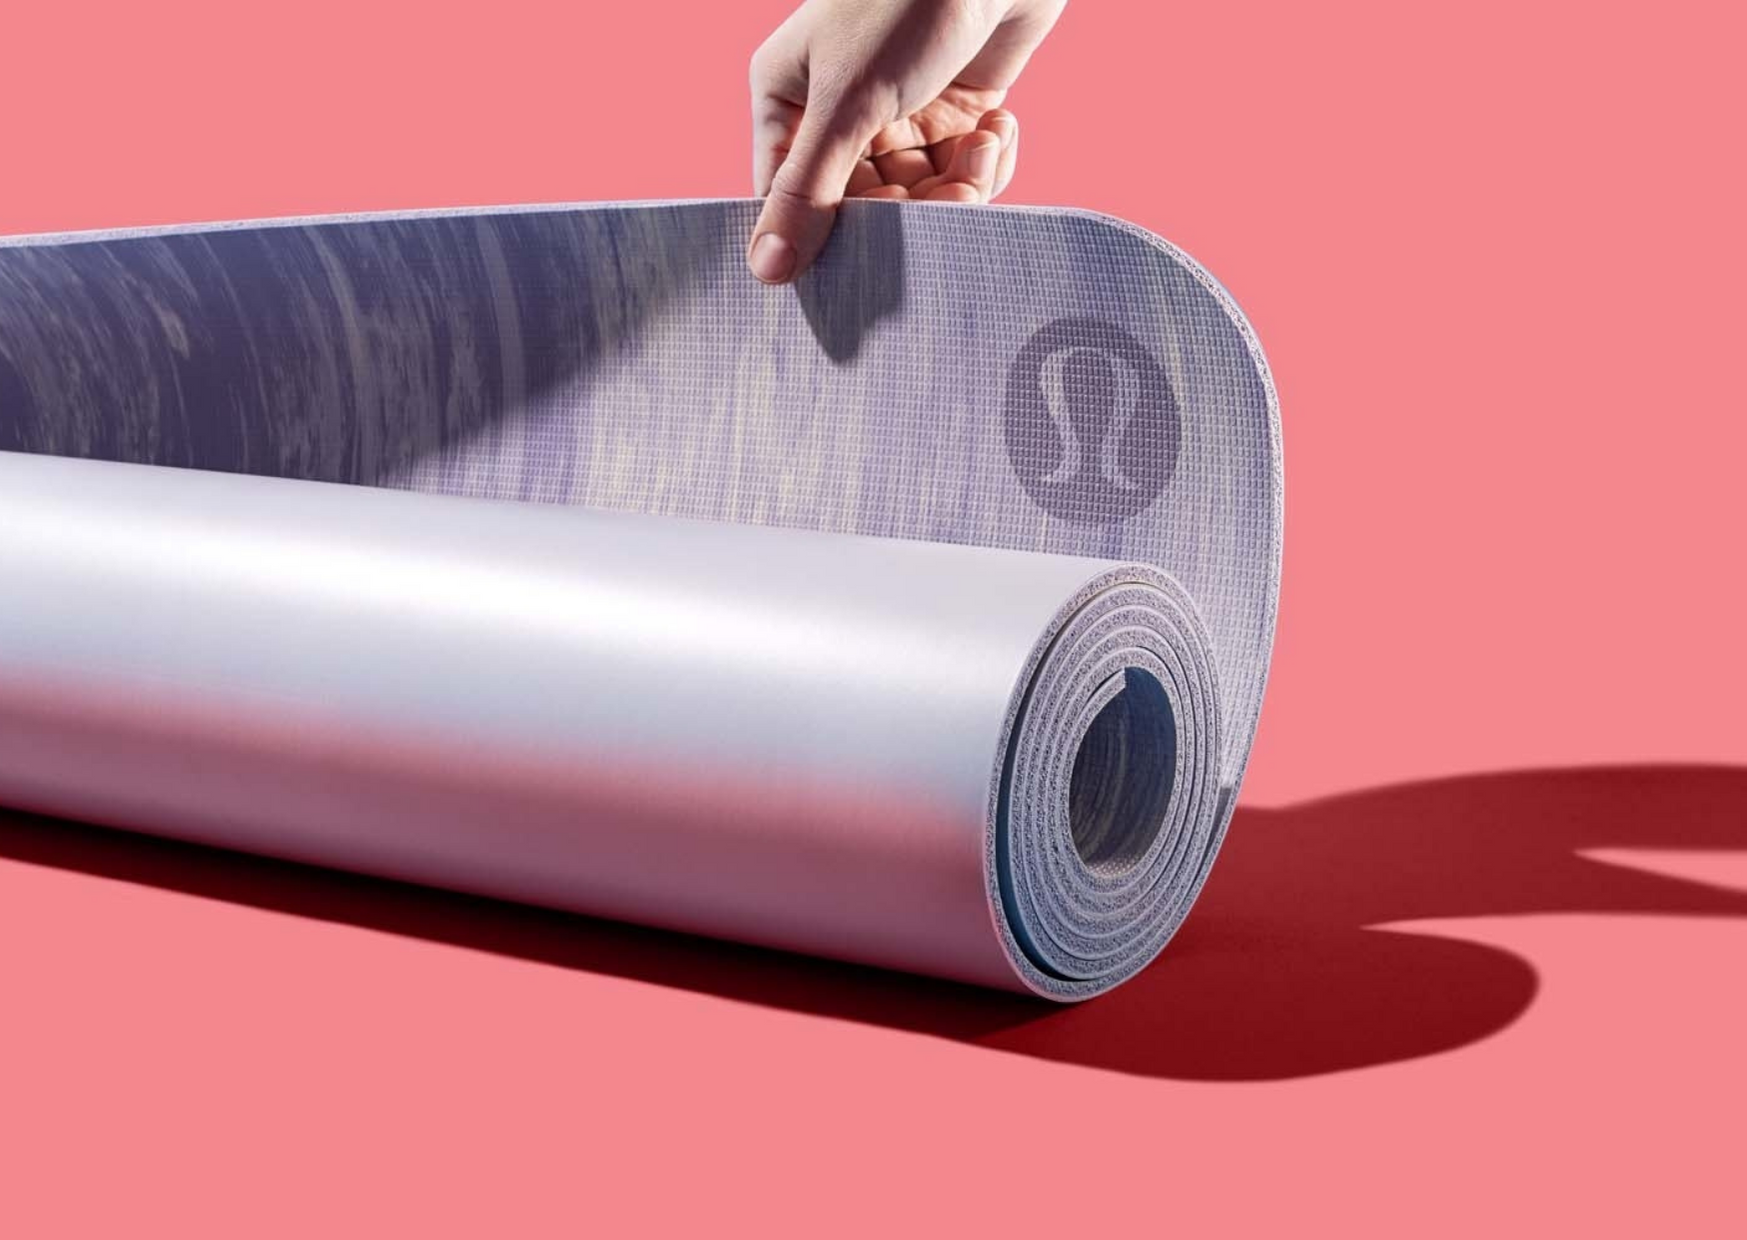 yoga mat of lululemon brand